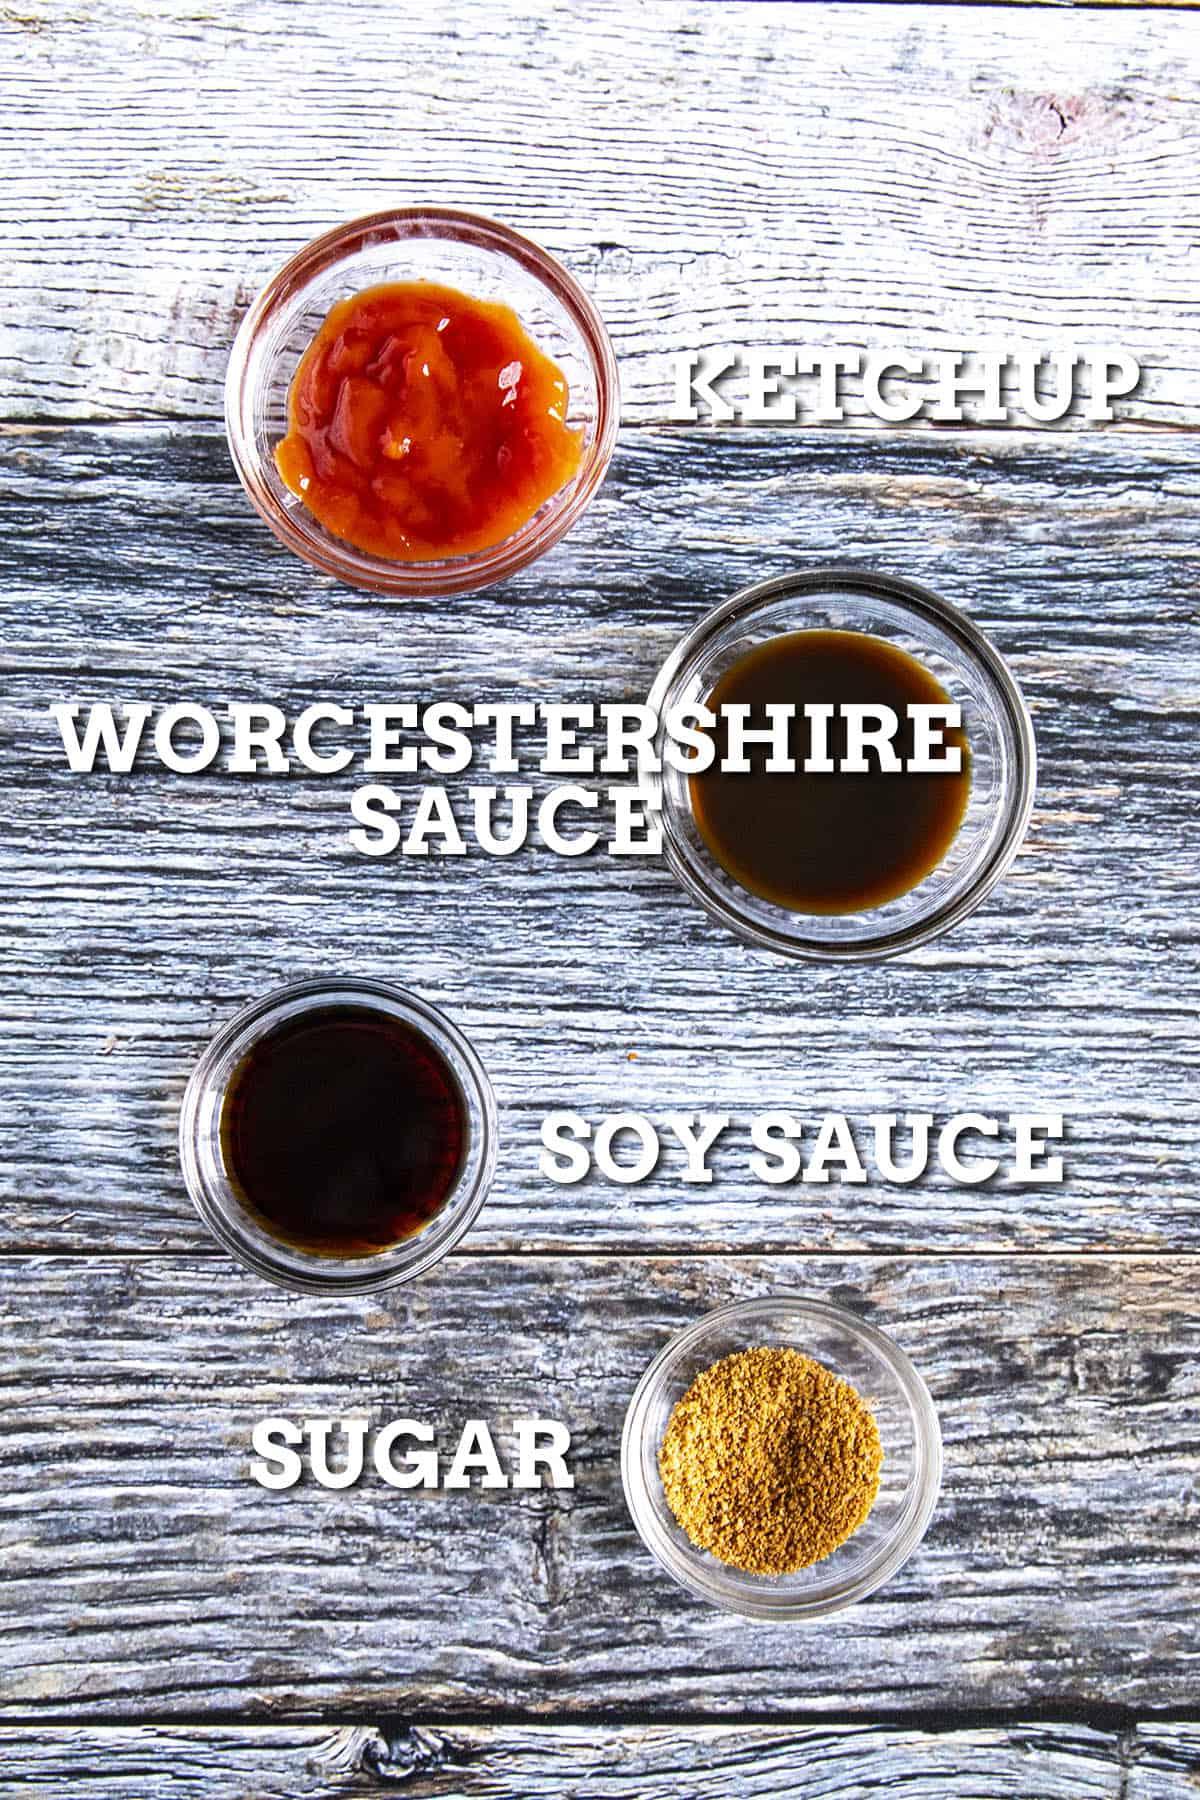 Tonkatsu Sauce Ingredients